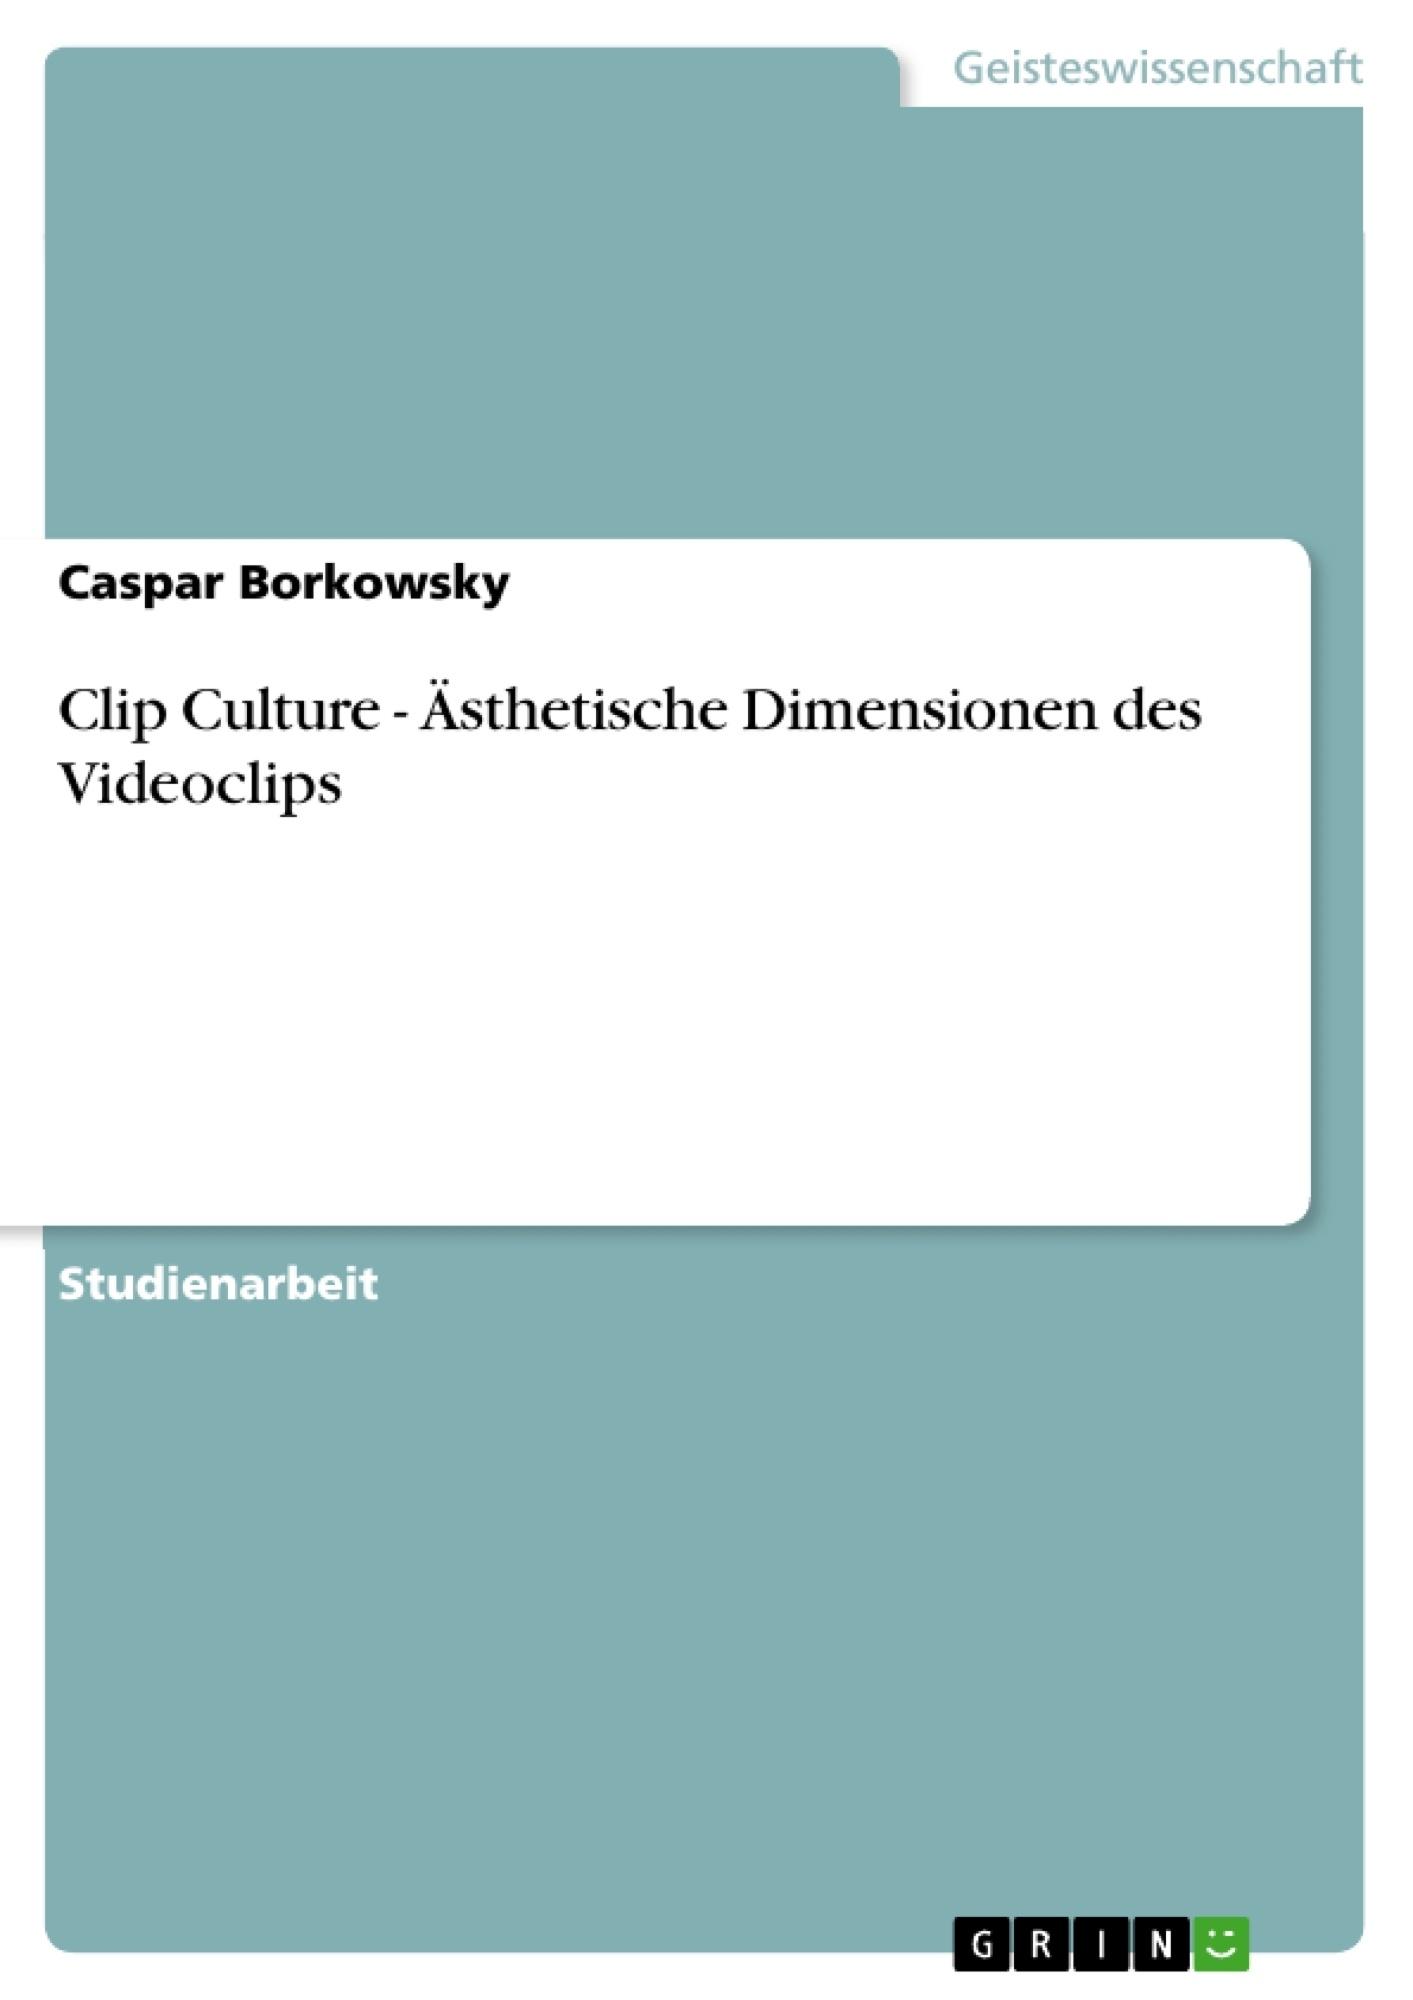 Titel: Clip Culture - Ästhetische Dimensionen des Videoclips